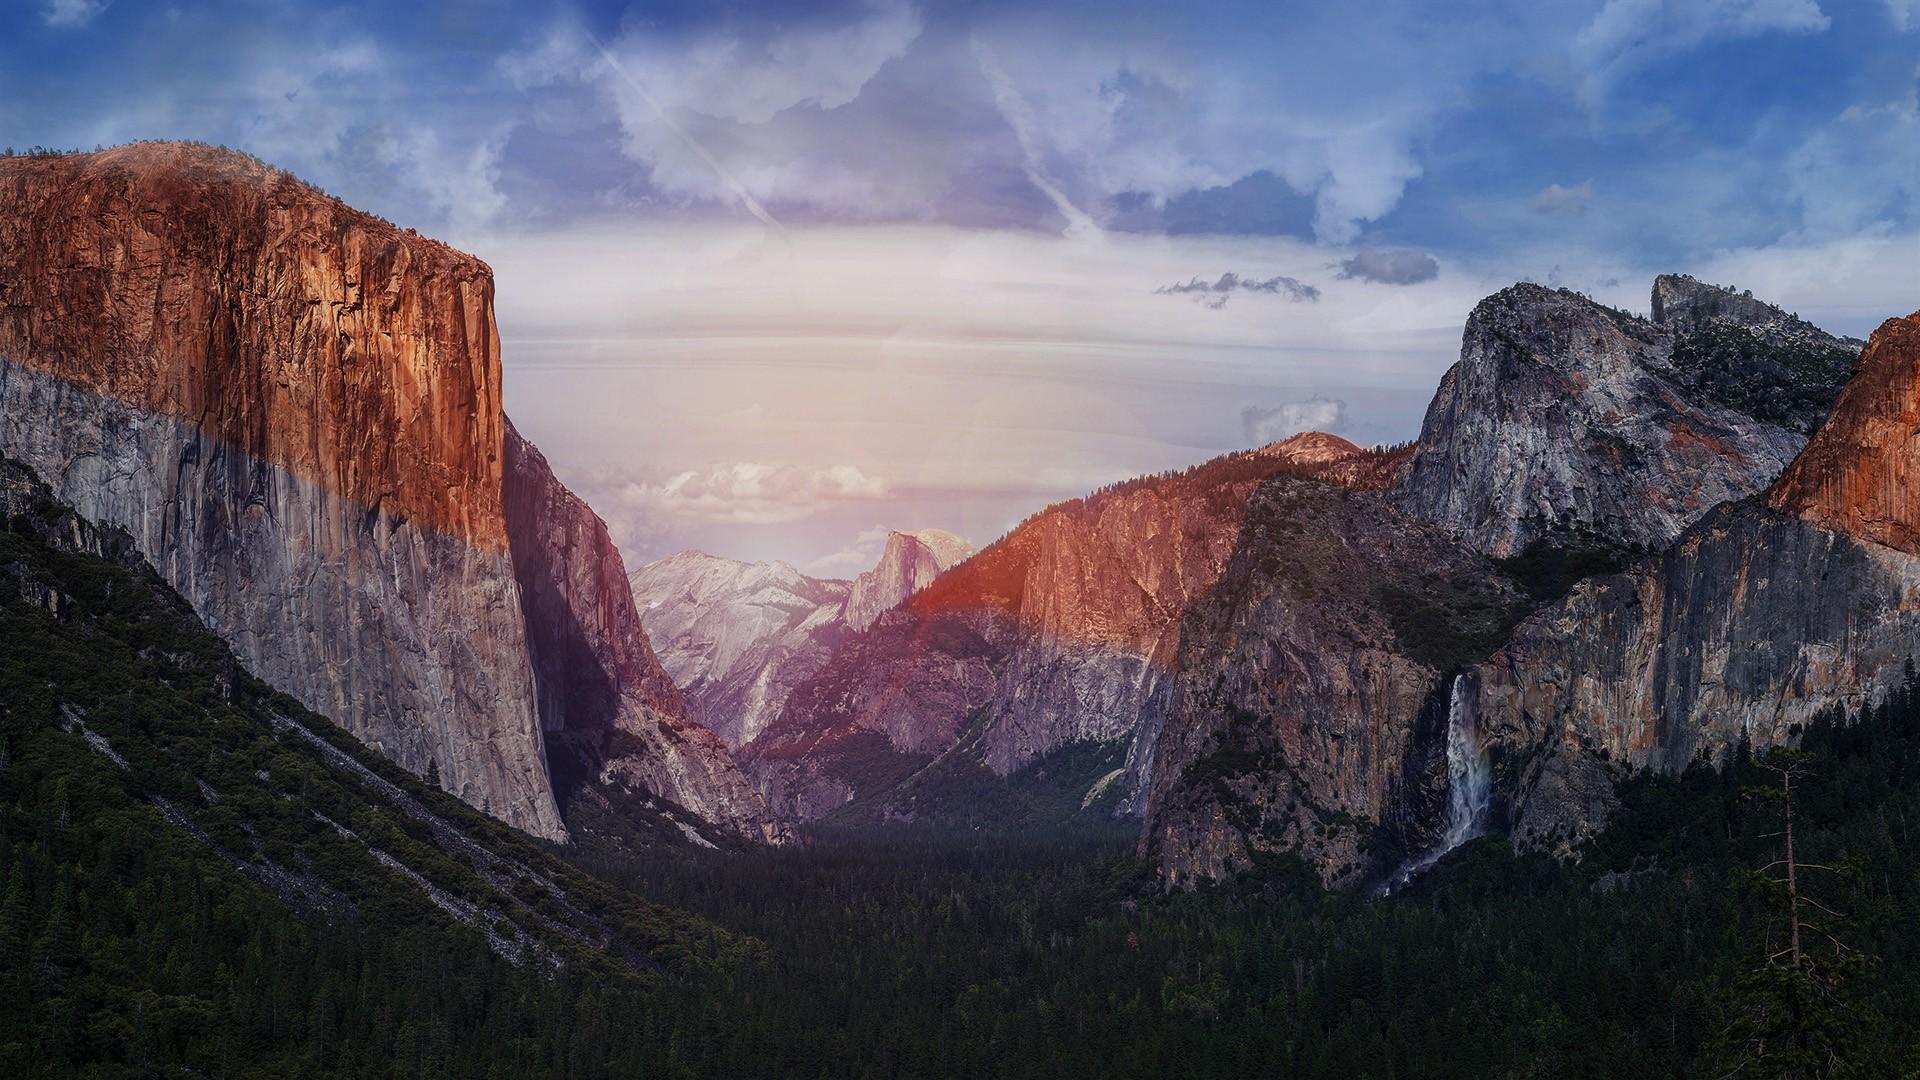 El Capitan Wallpaper Download Free Cool Backgrounds For